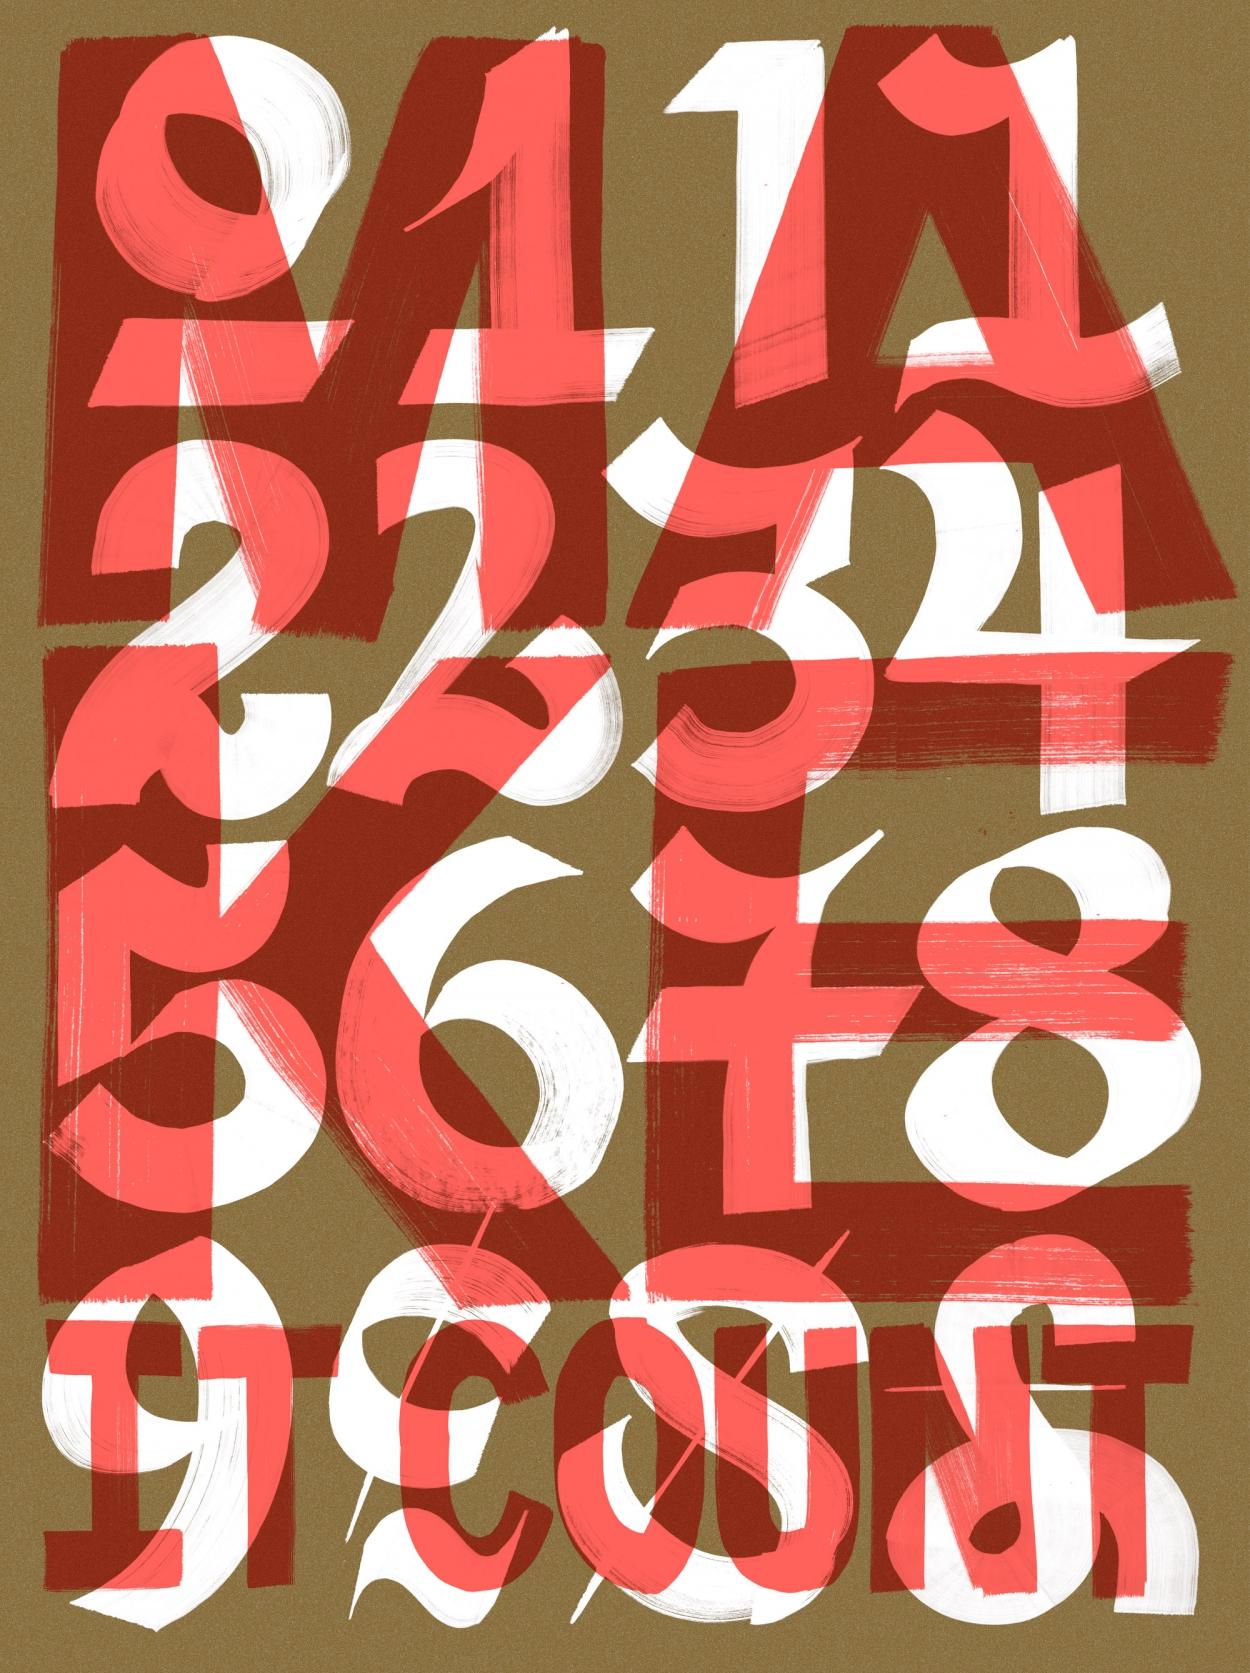 Erik Marinovich - Friends of Type - Make it Count